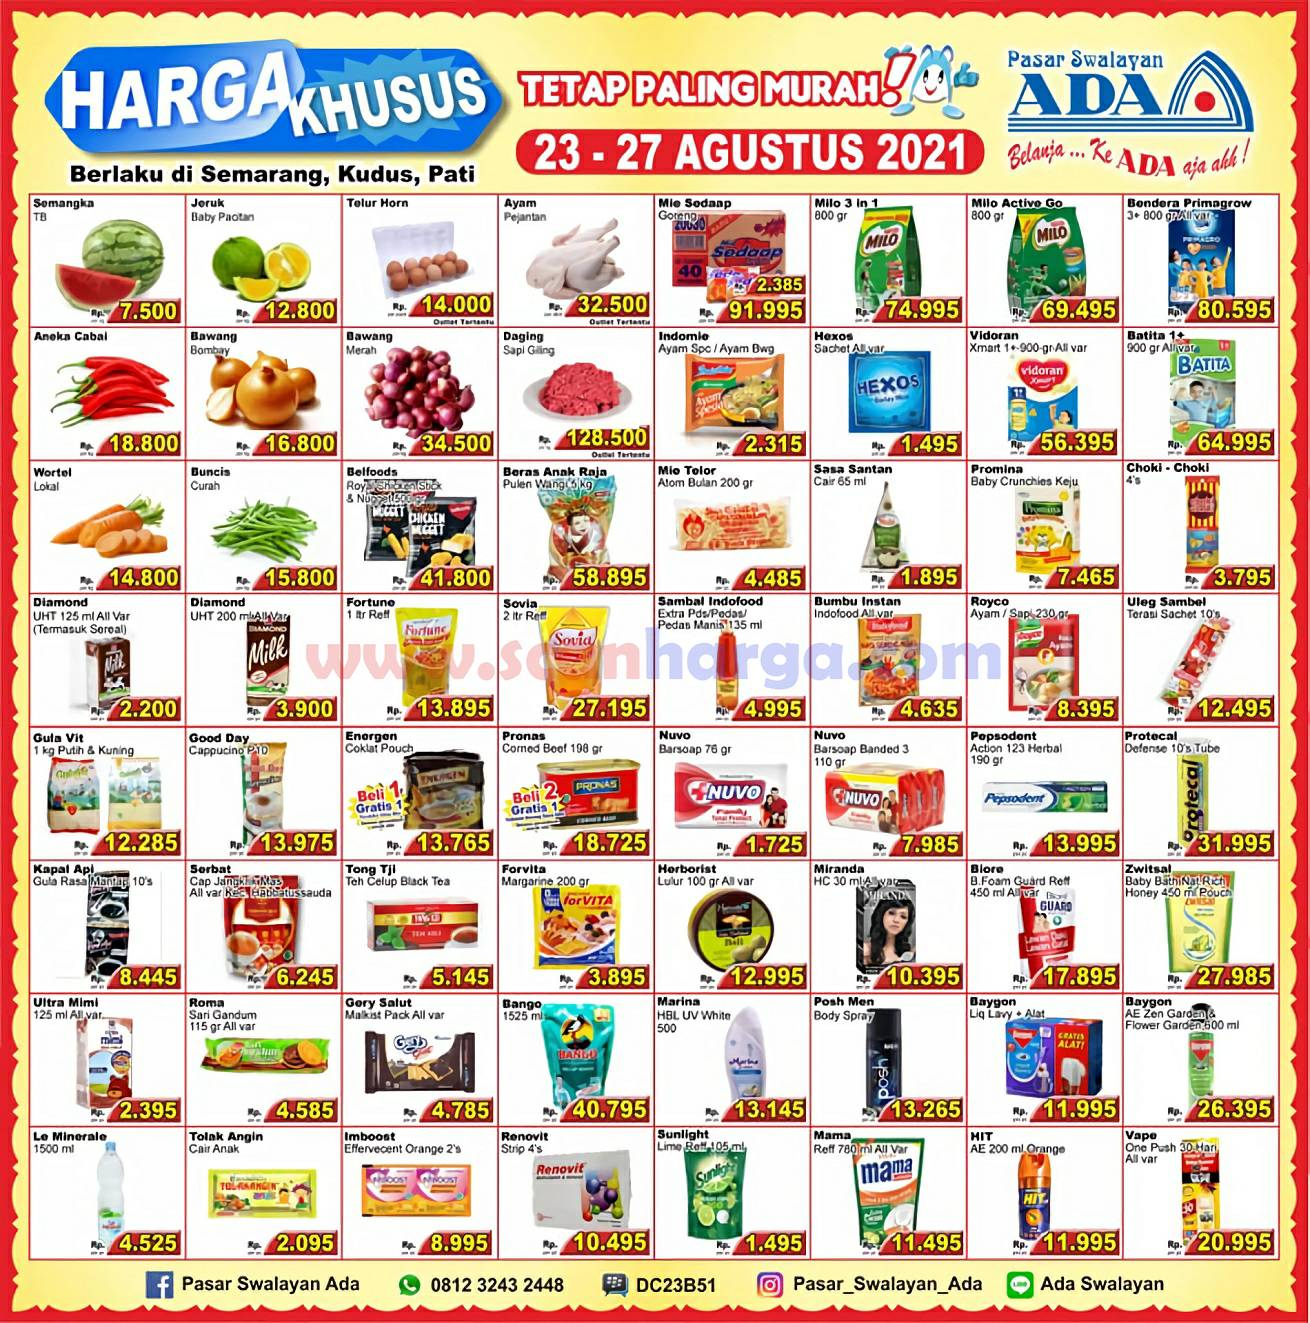 Promo Katalog Ada Swalayan Weekday Harga Khusus 23 - 27 Agustus 2021